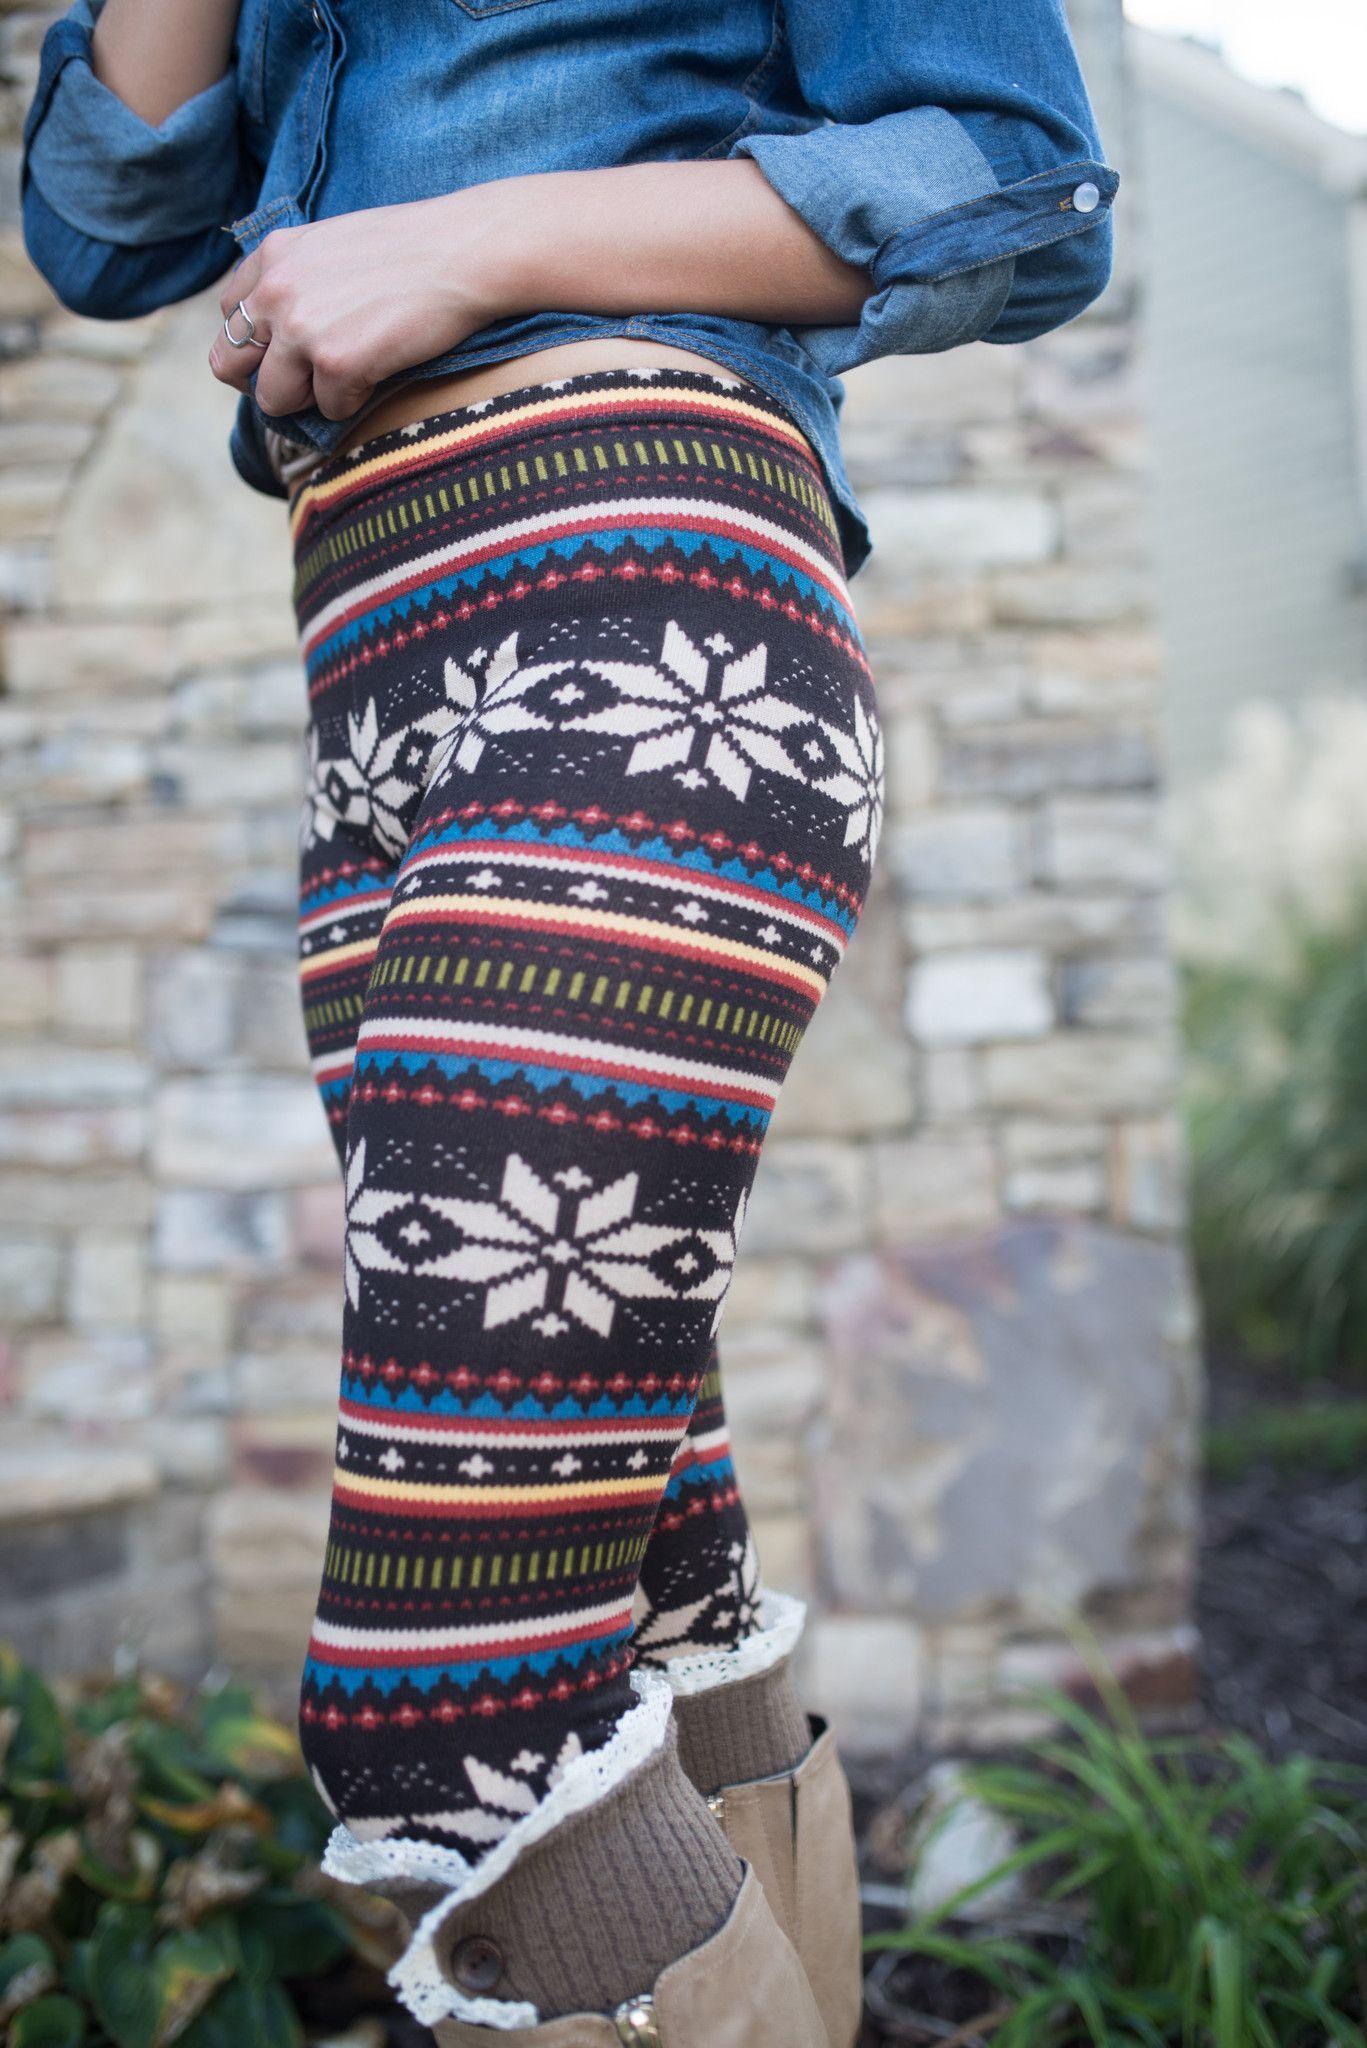 Winter Printed Leggings from Spool of Dreams